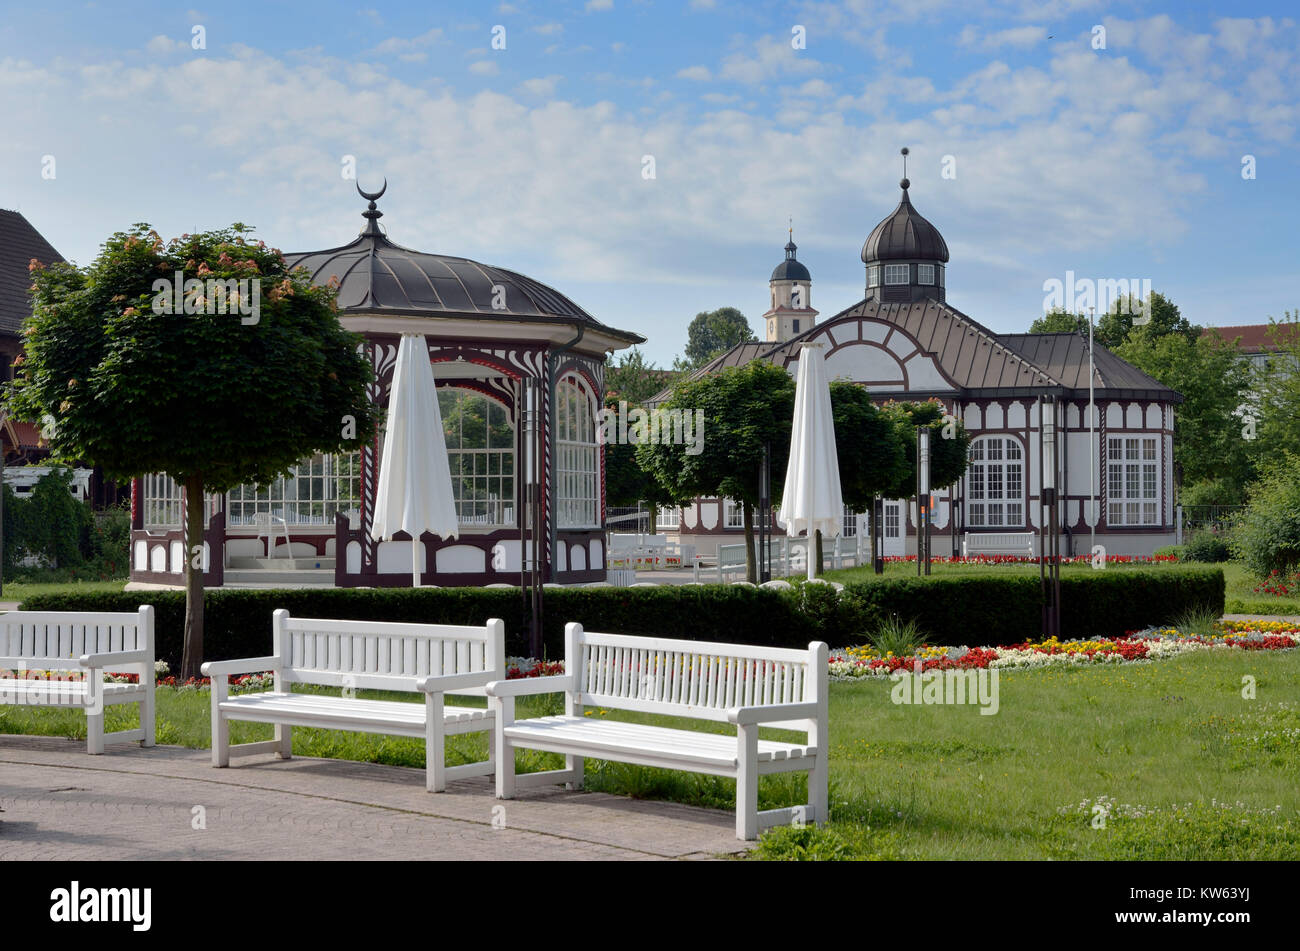 Grand Hotel Ahlbeck